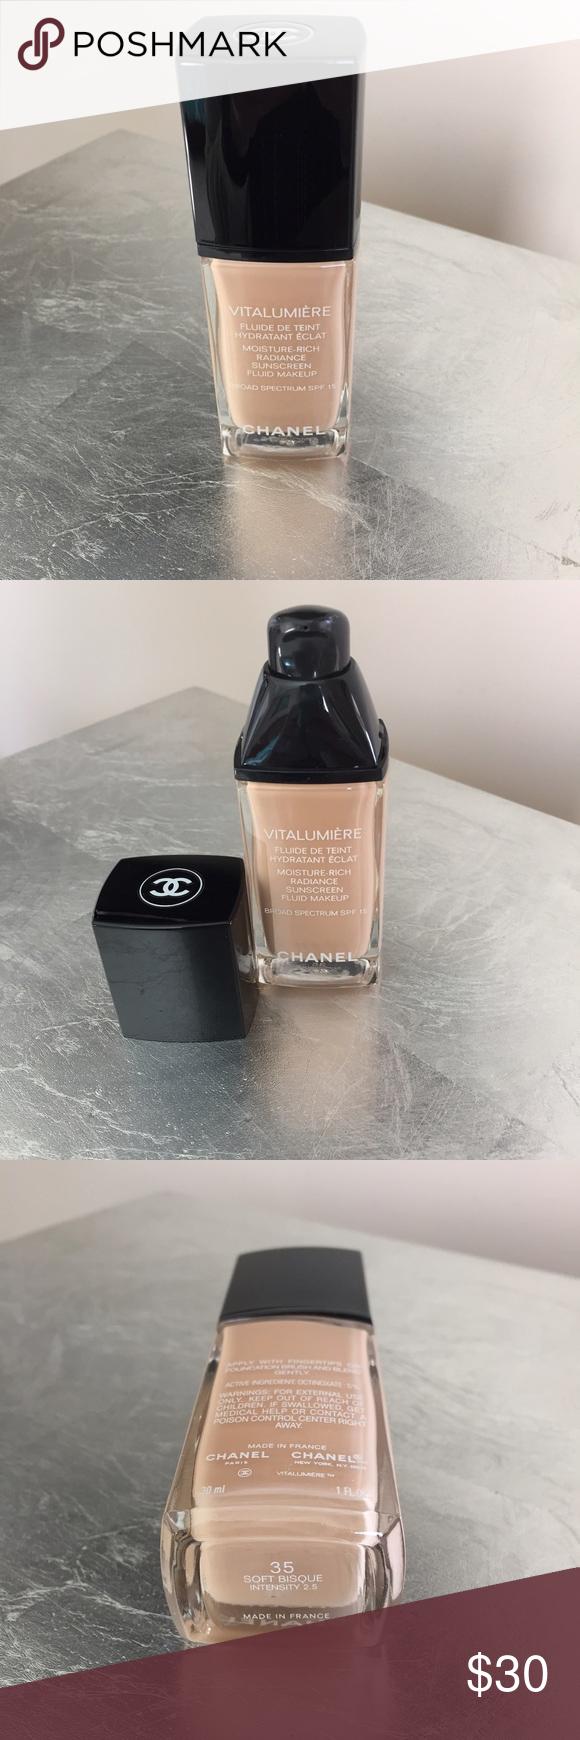 CHANEL VITALUMIÈRE Foundation Chanel makeup foundation